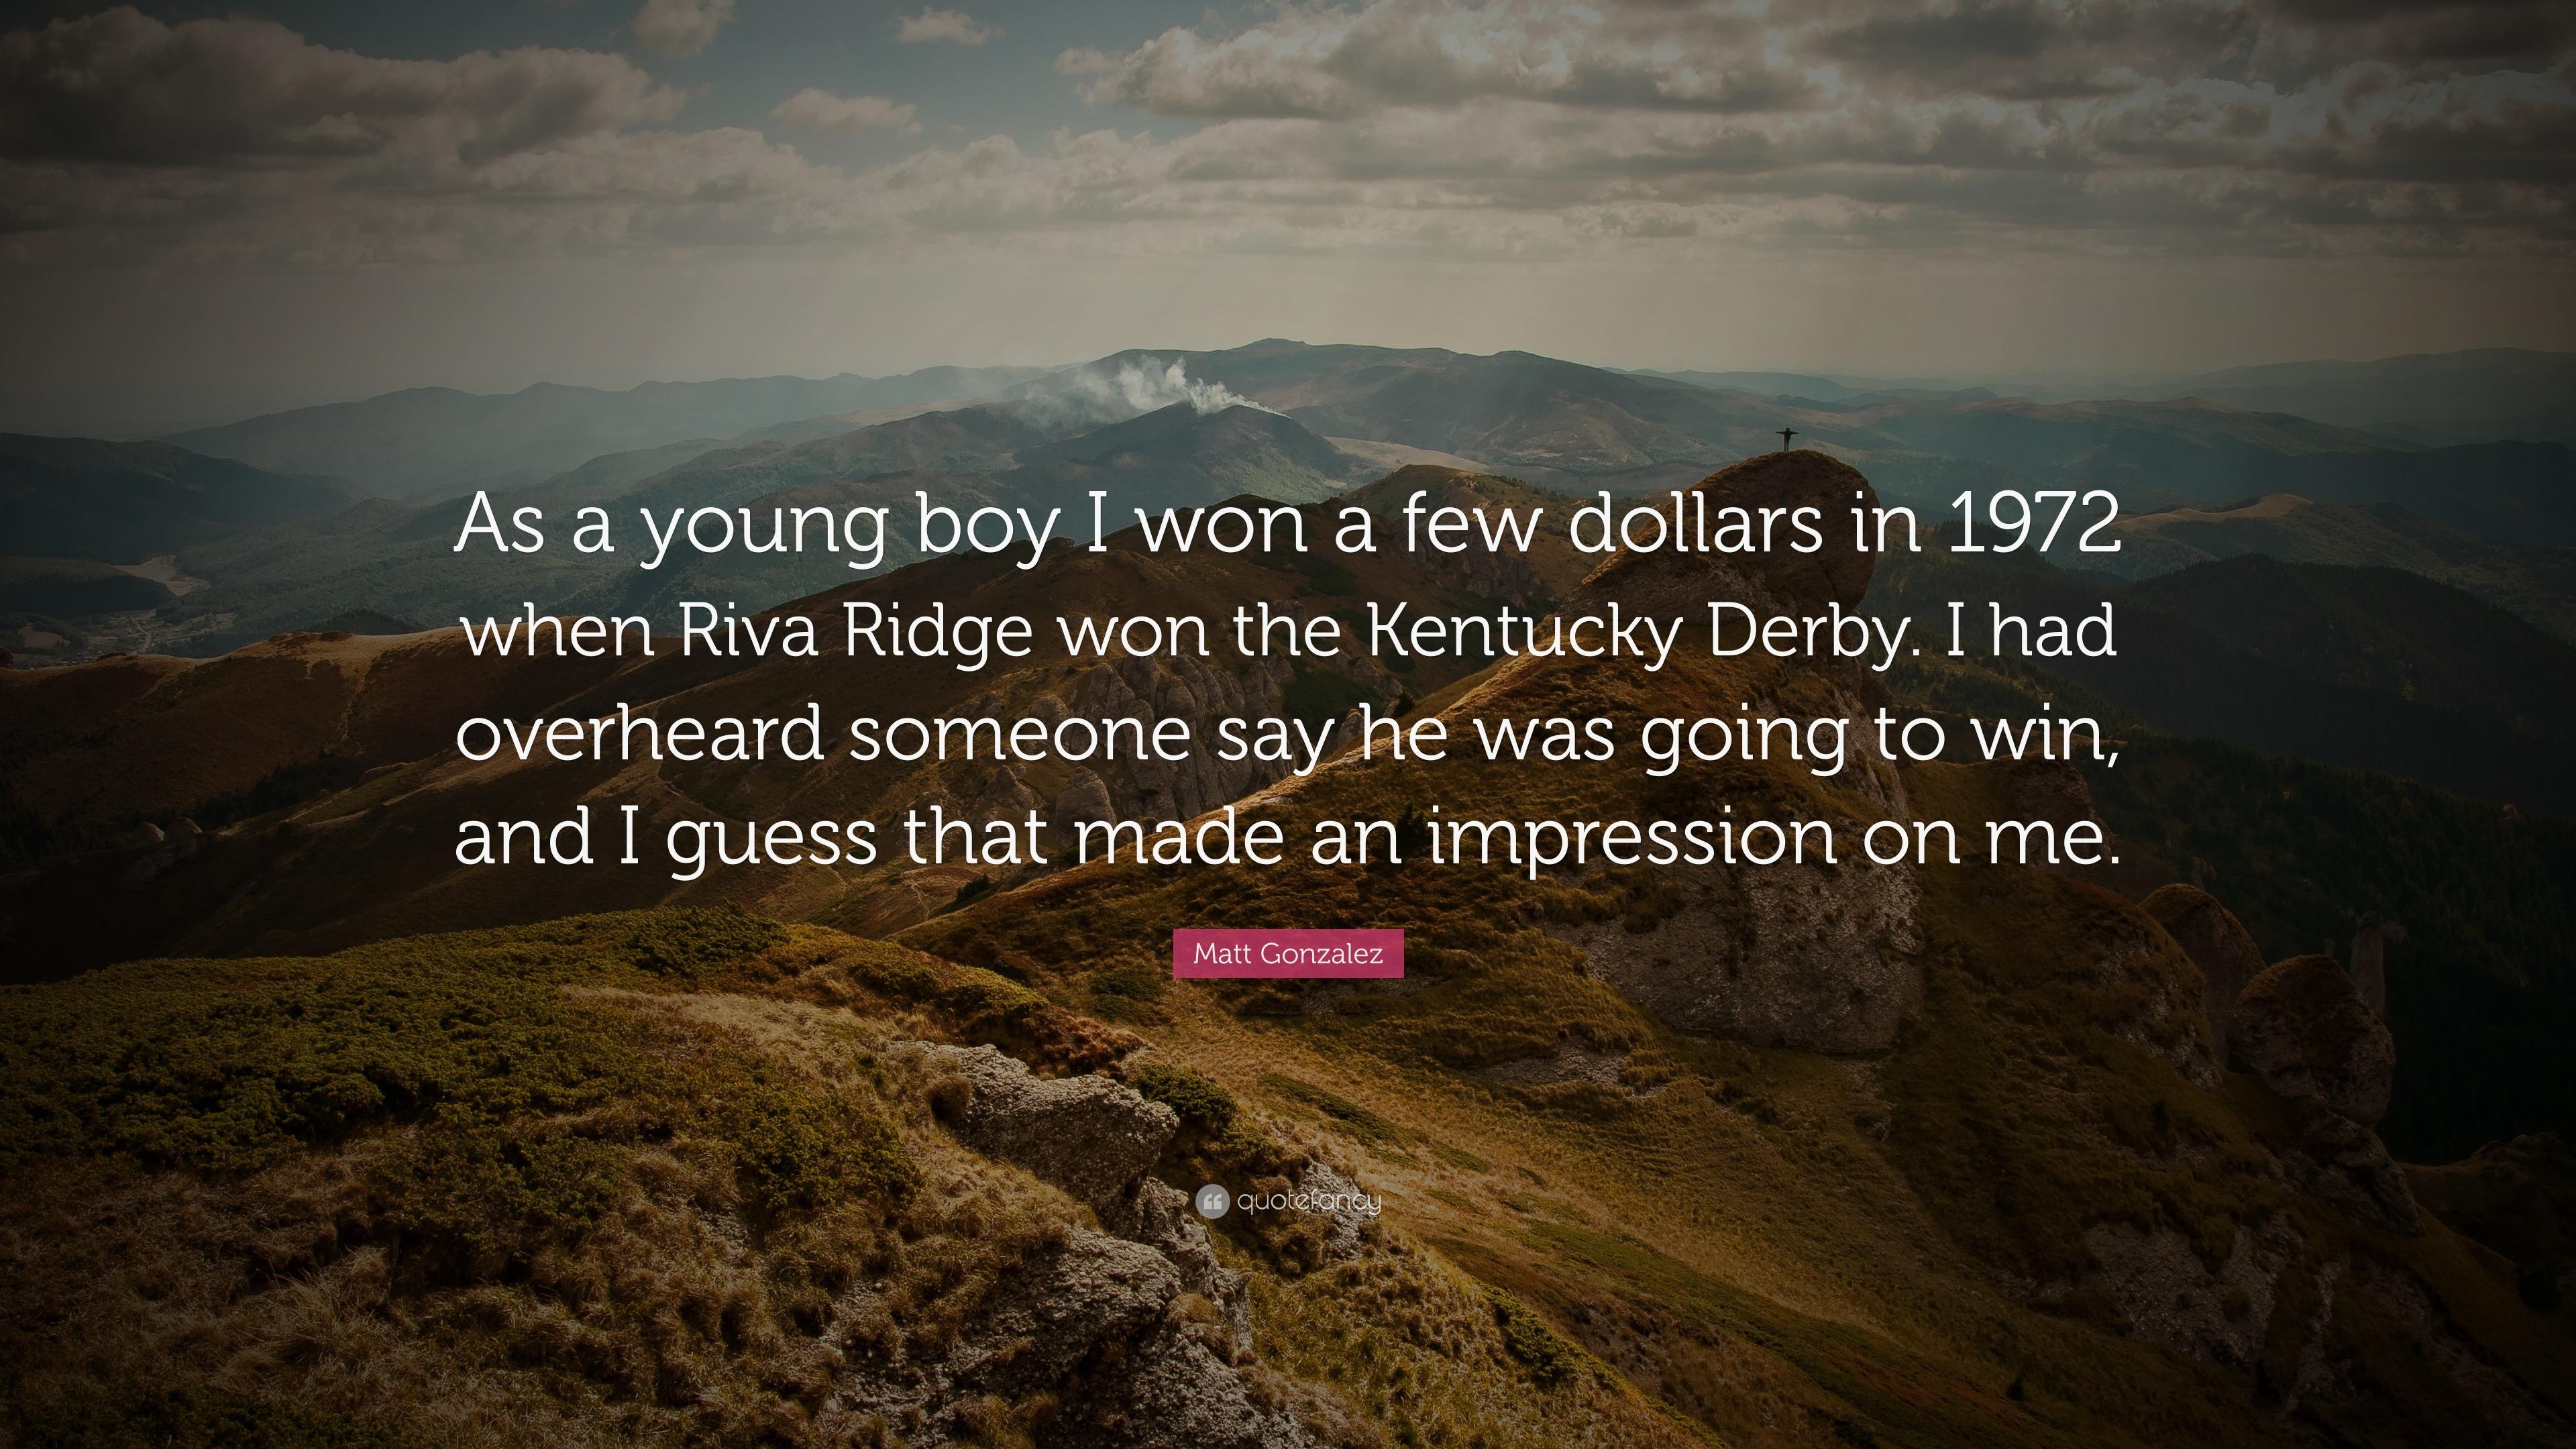 For A Few Dollars More Quotes: Matt Gonzalez Quotes (22 Wallpapers)